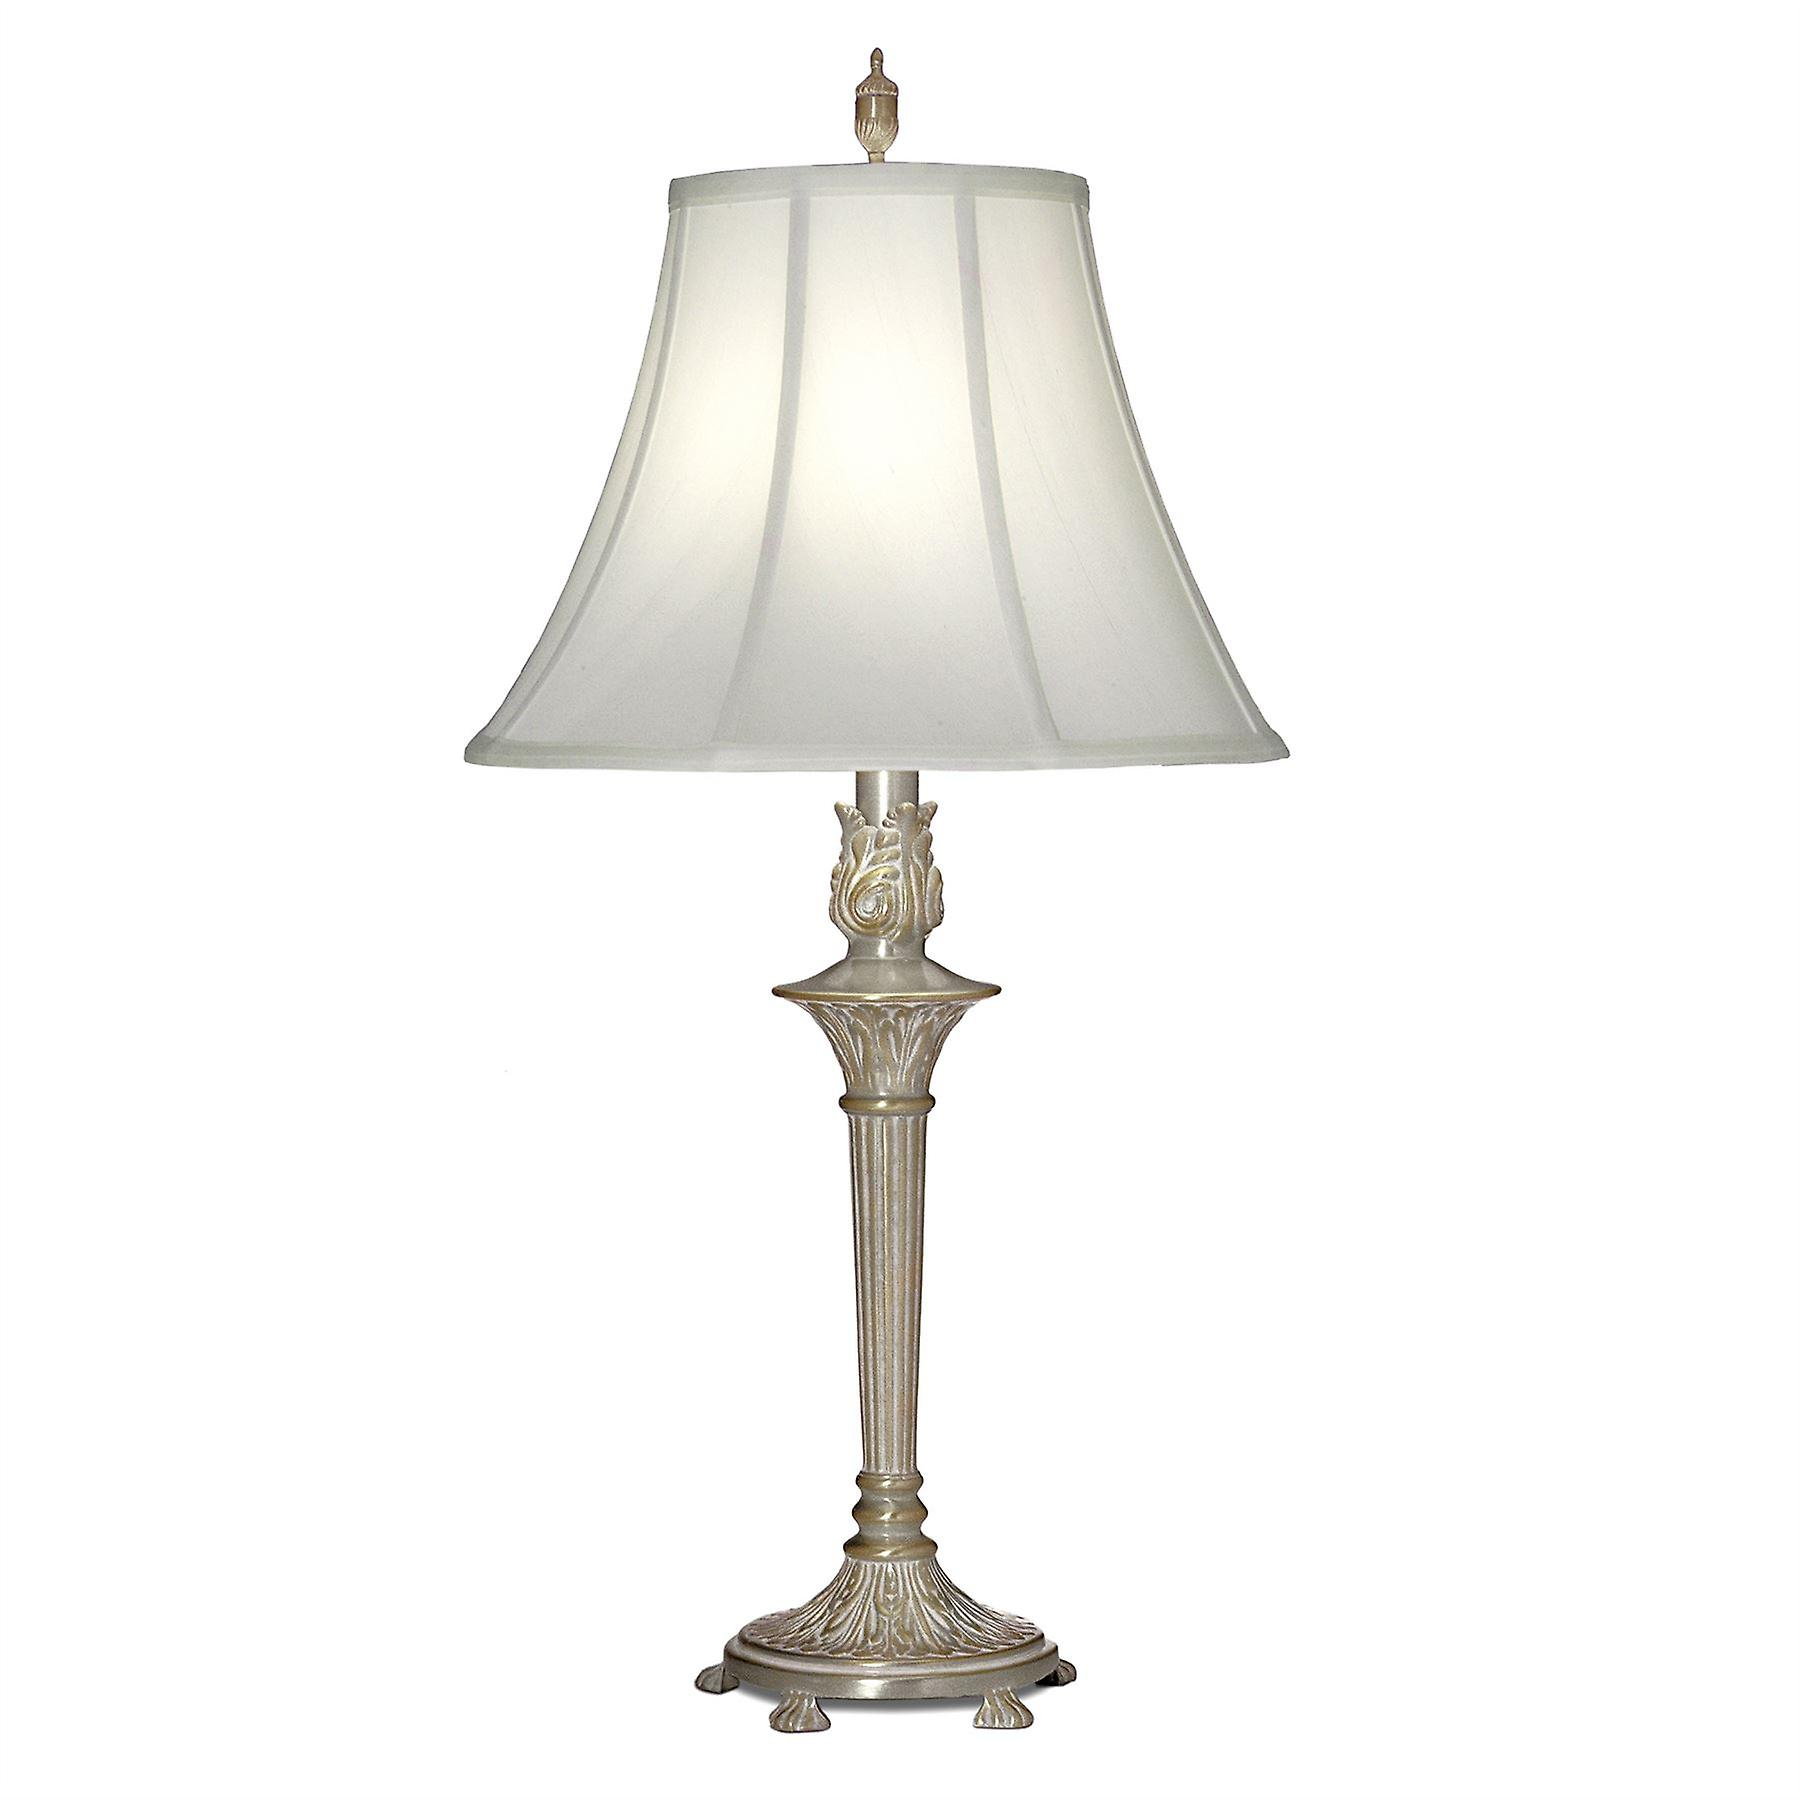 SF HAMPTON Table Lamp  - Elstead lumièreing Sf   SF HAMPTON